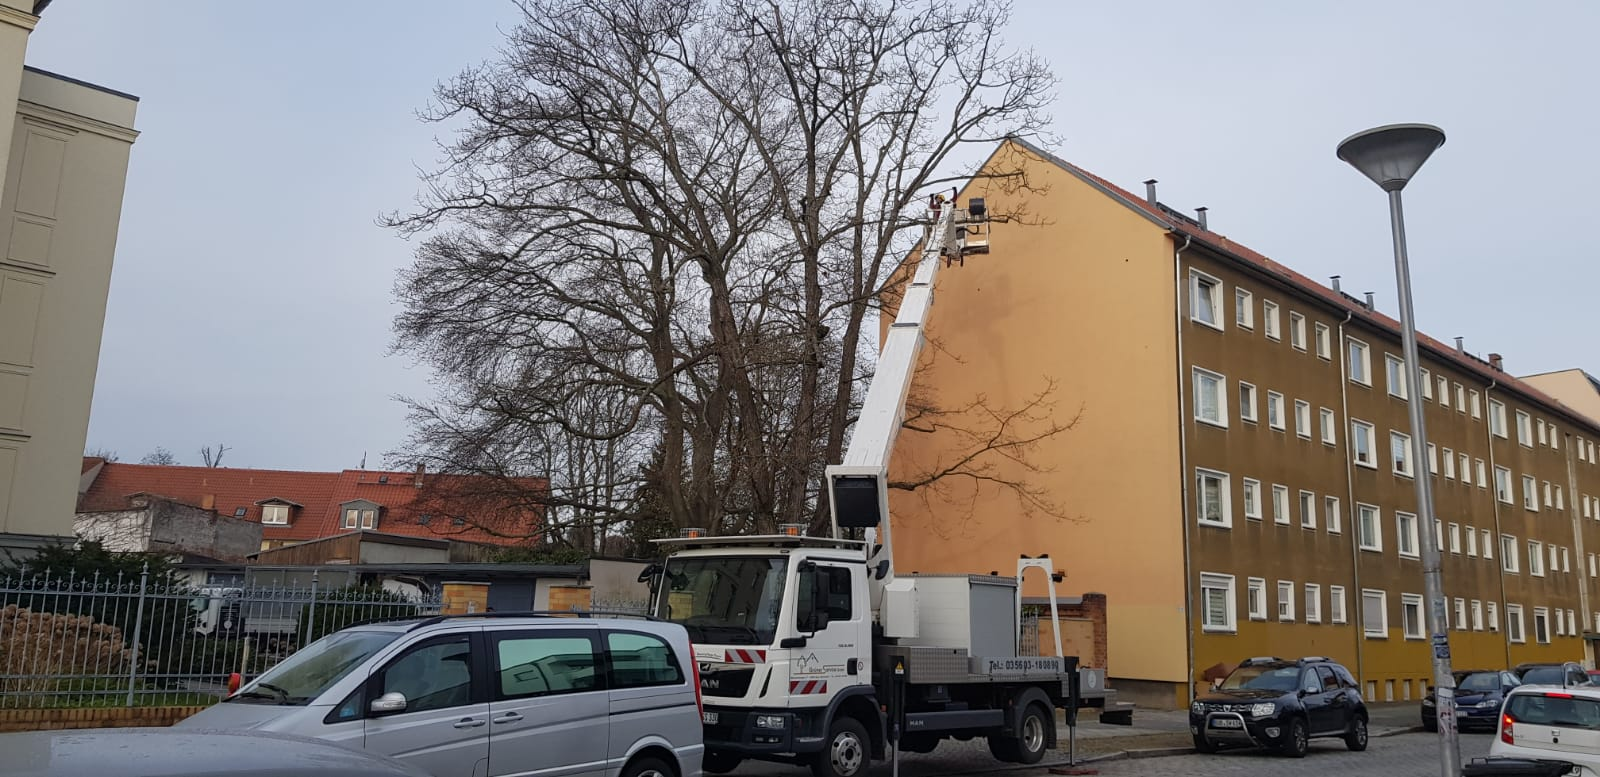 Totholzbeseitigung in Cottbus